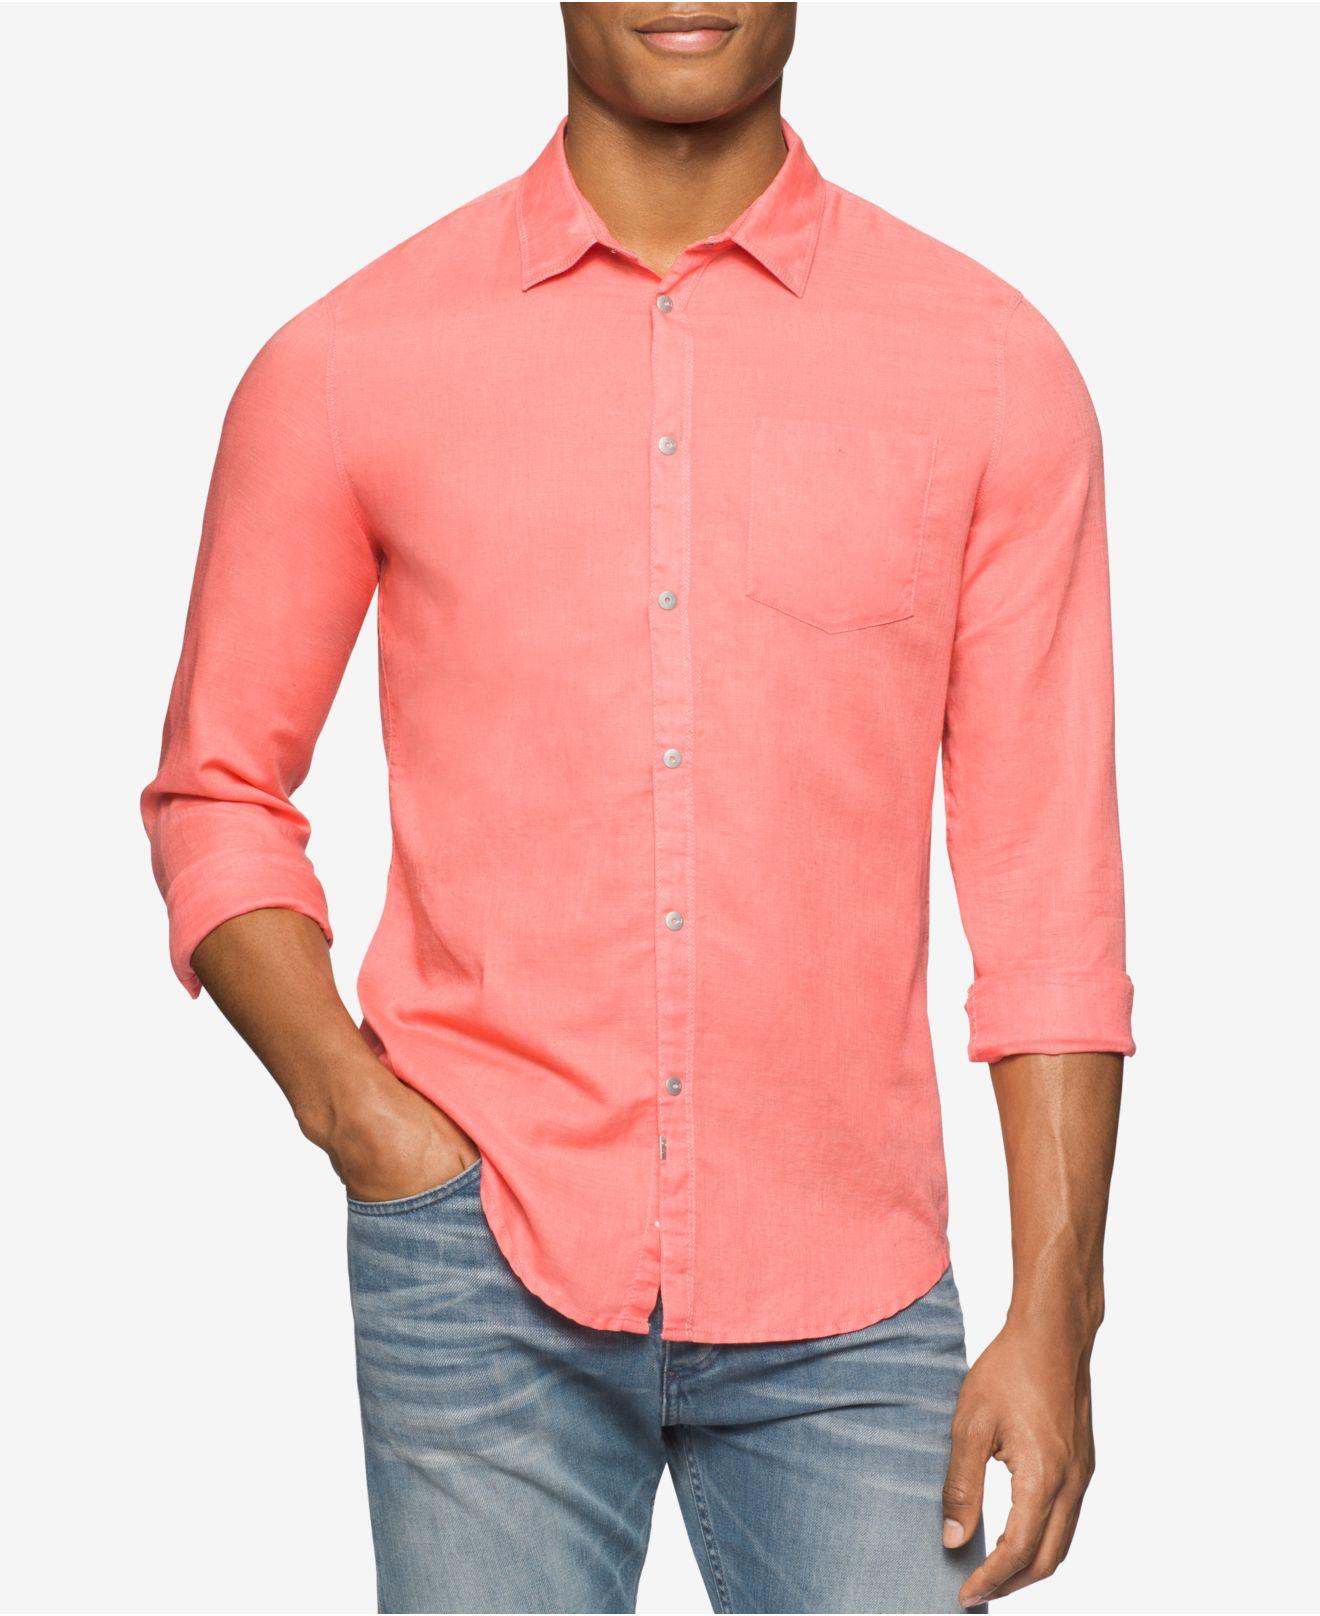 calvin klein jeans men 39 s snap front long sleeve shirt in. Black Bedroom Furniture Sets. Home Design Ideas